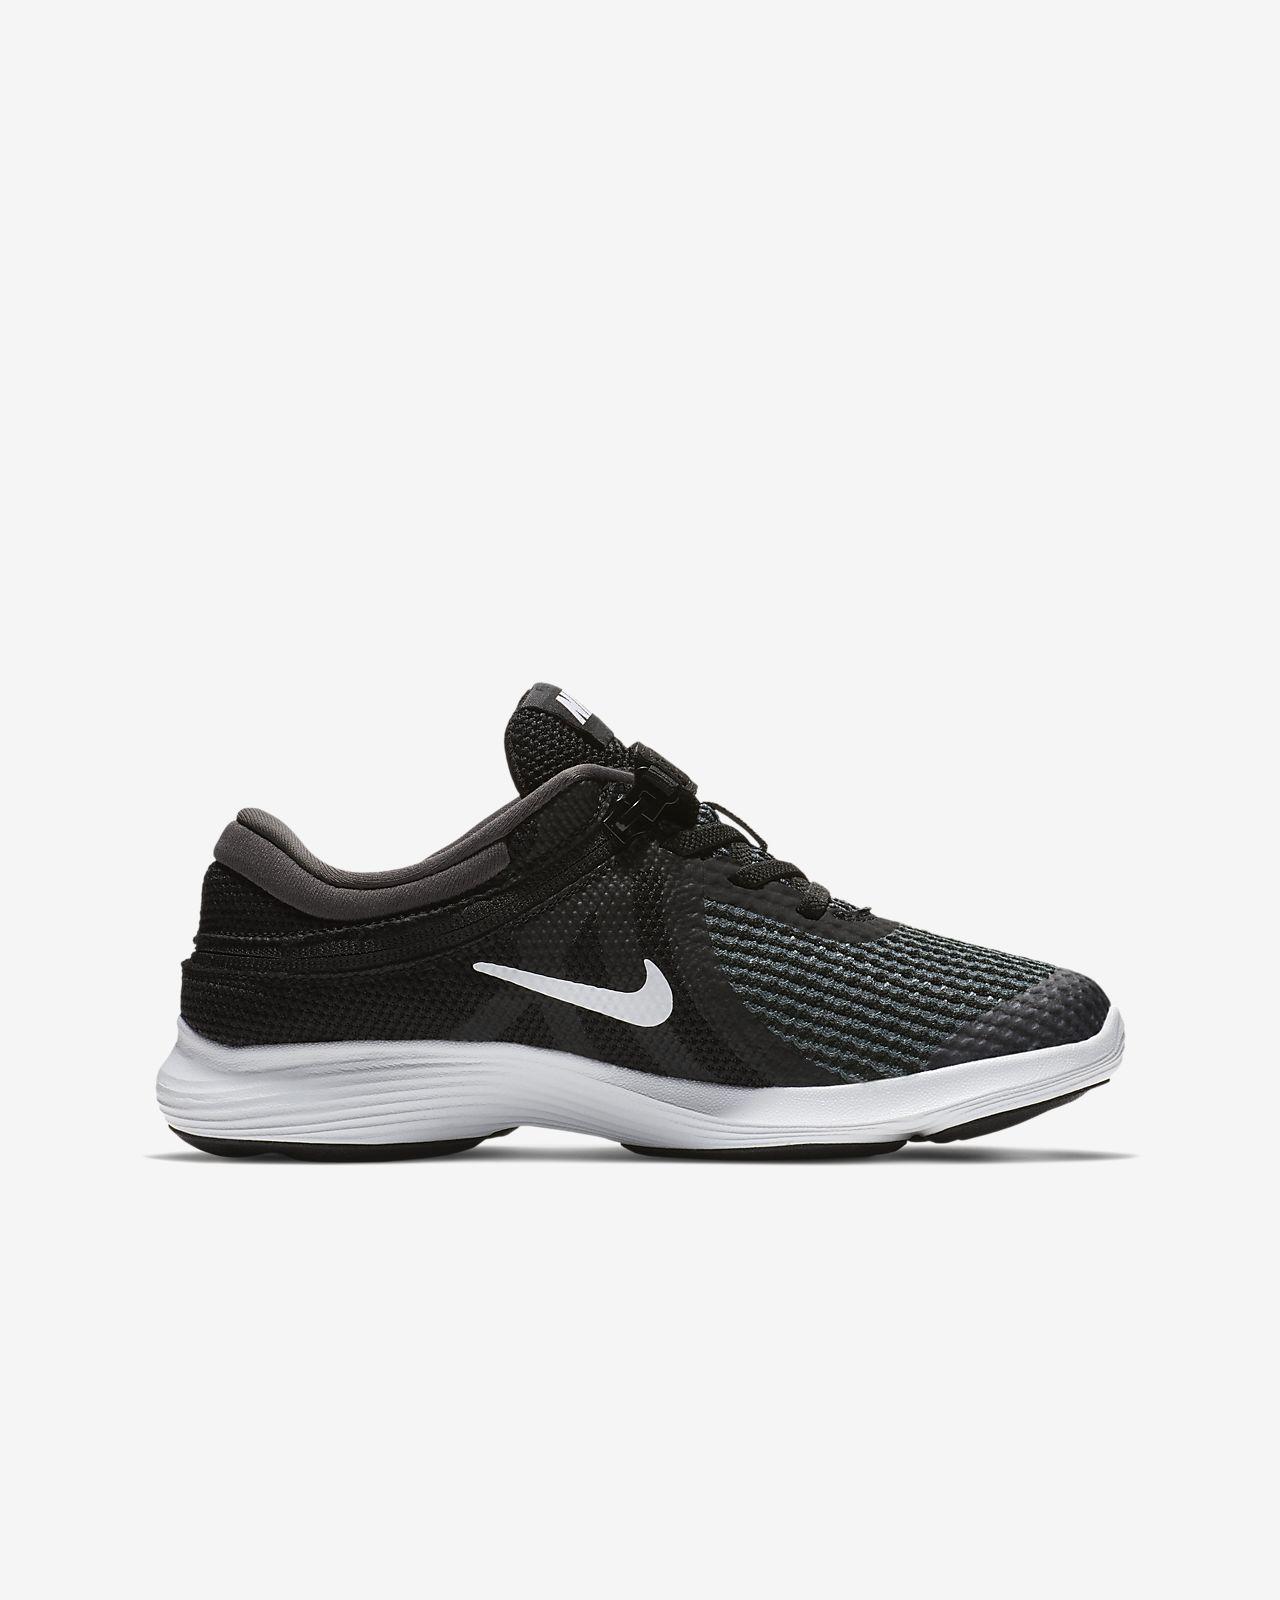 Sapatilhas de running Nike Revolution 4 FlyEase Júnior